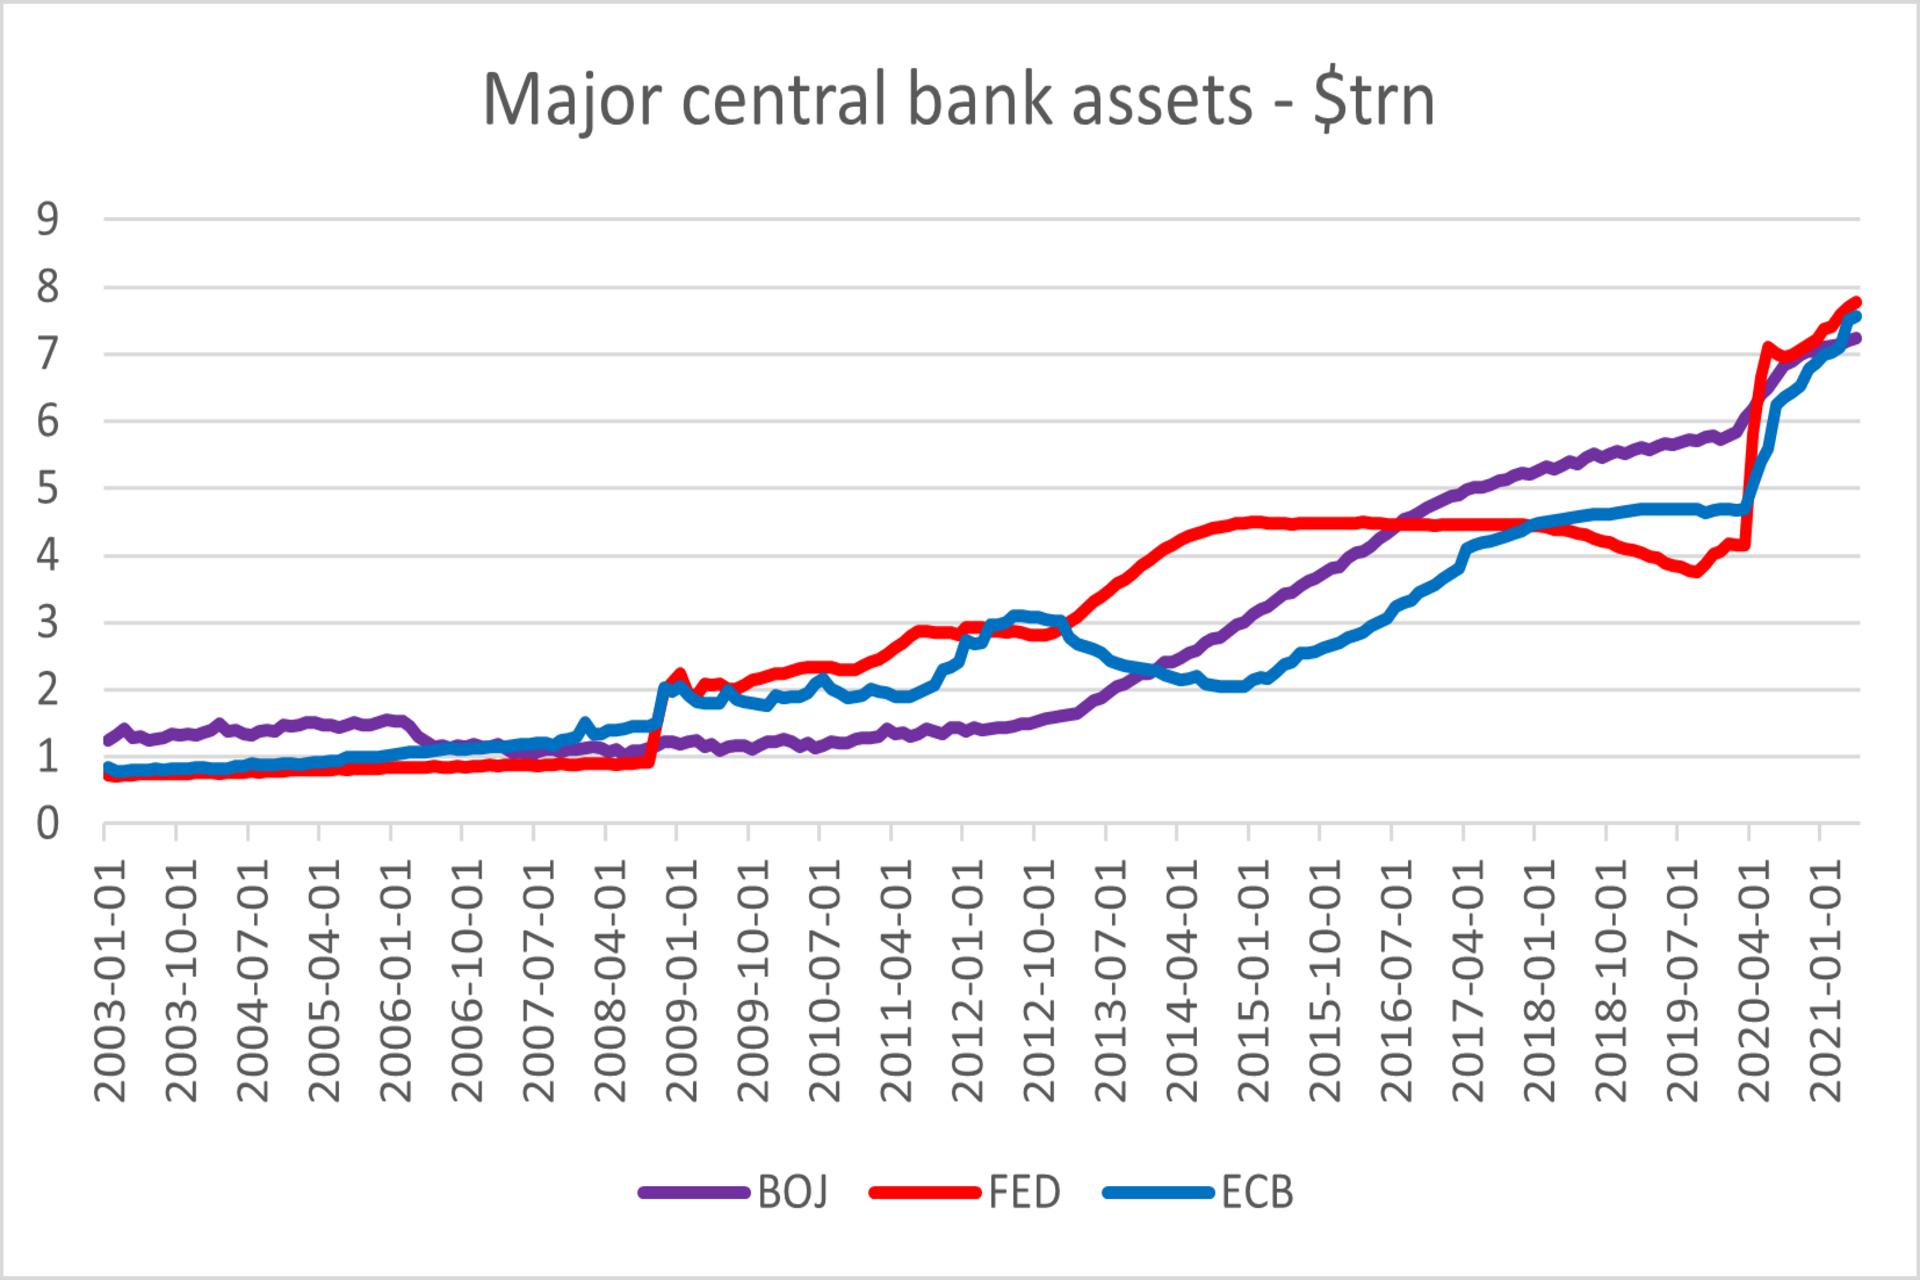 Major central bank bal sheet chart